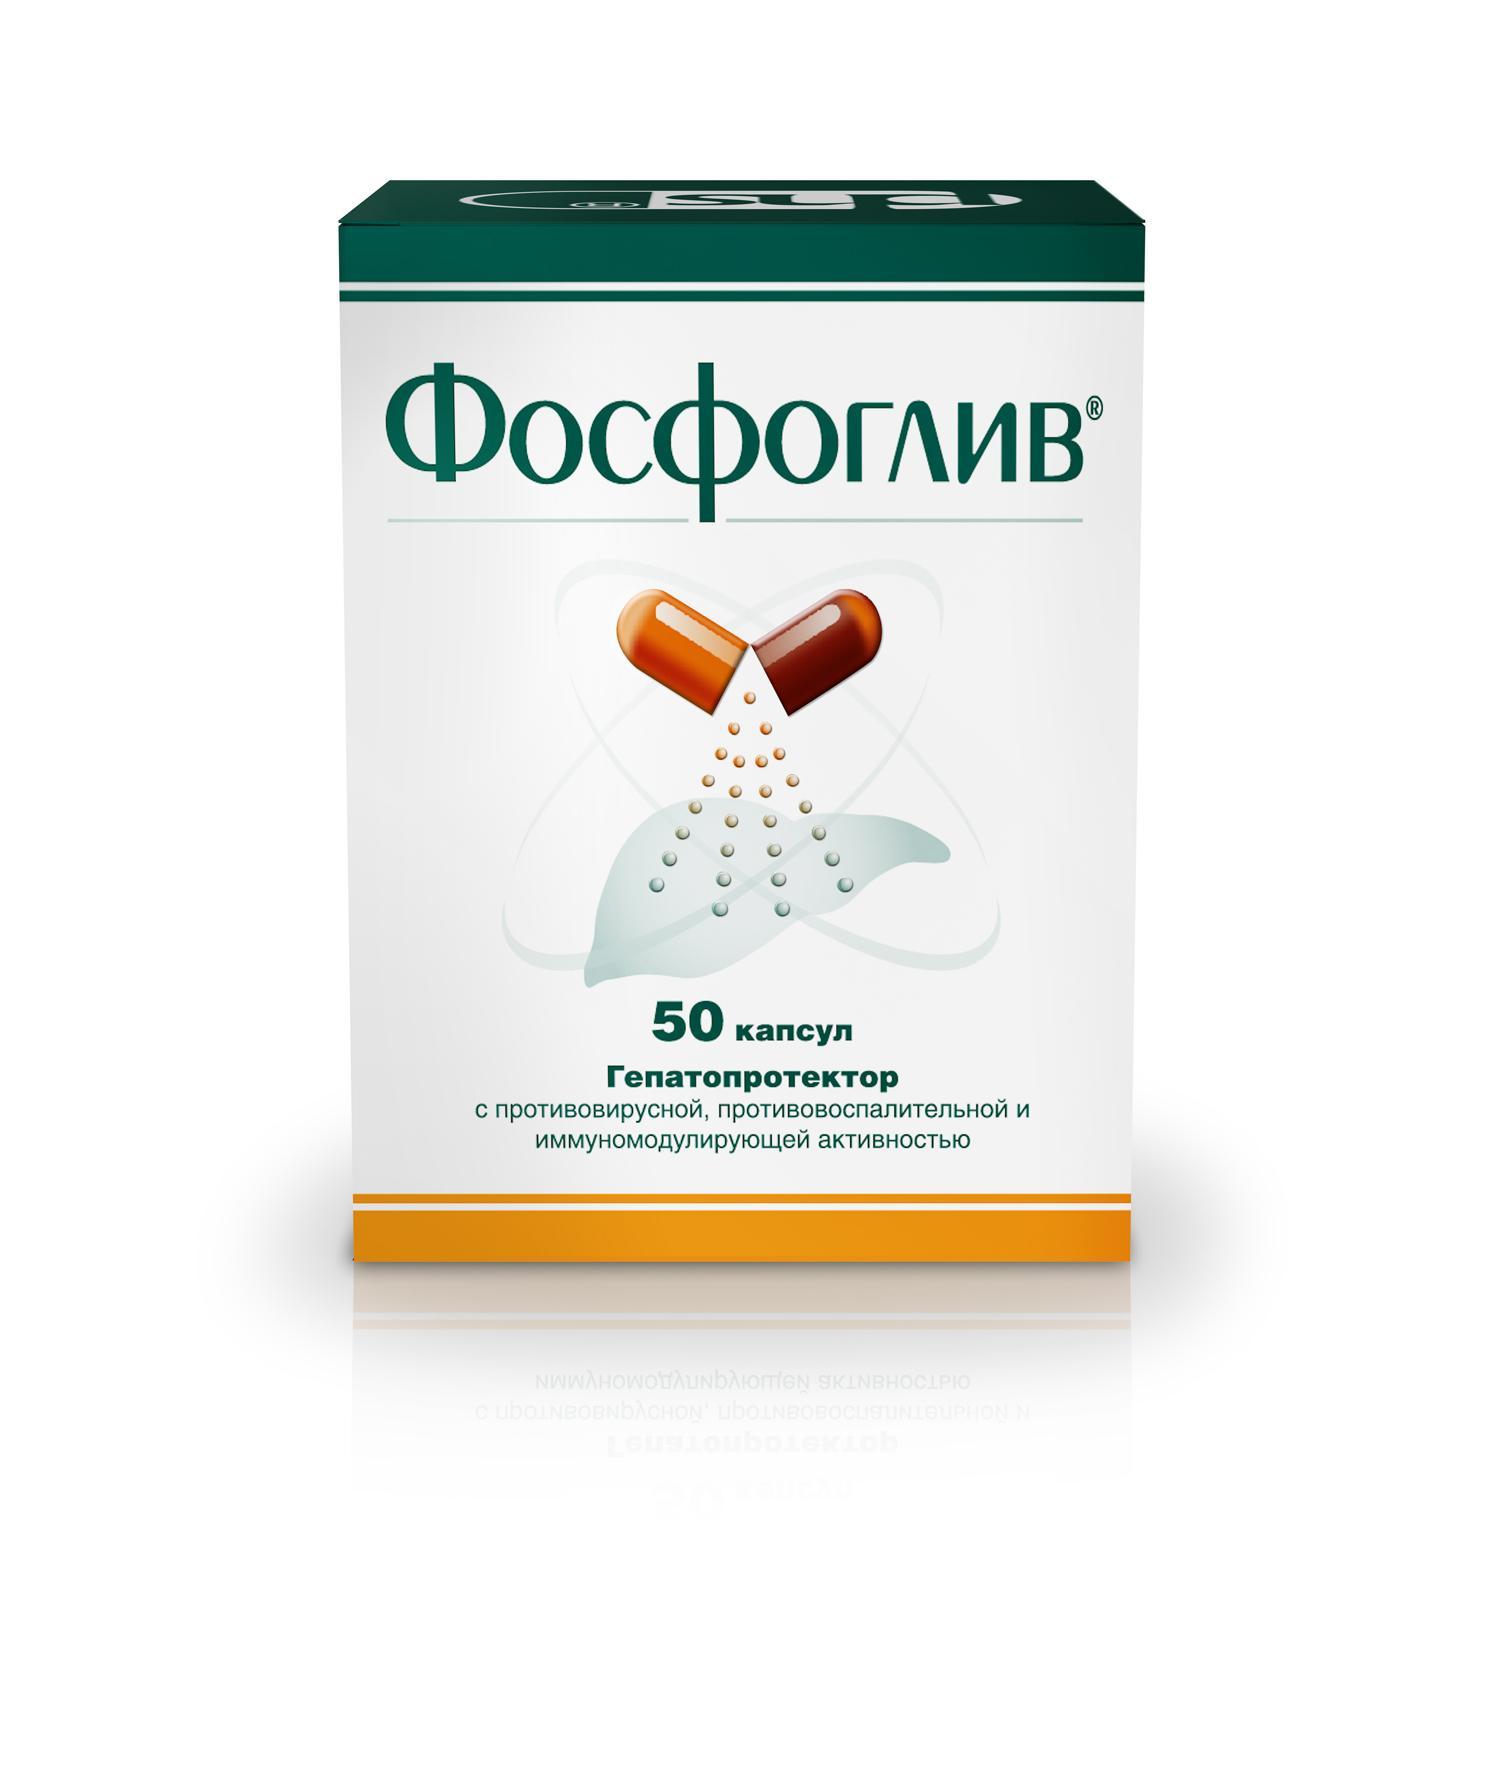 Фосфоглив — эффективный препарат при гепатите С